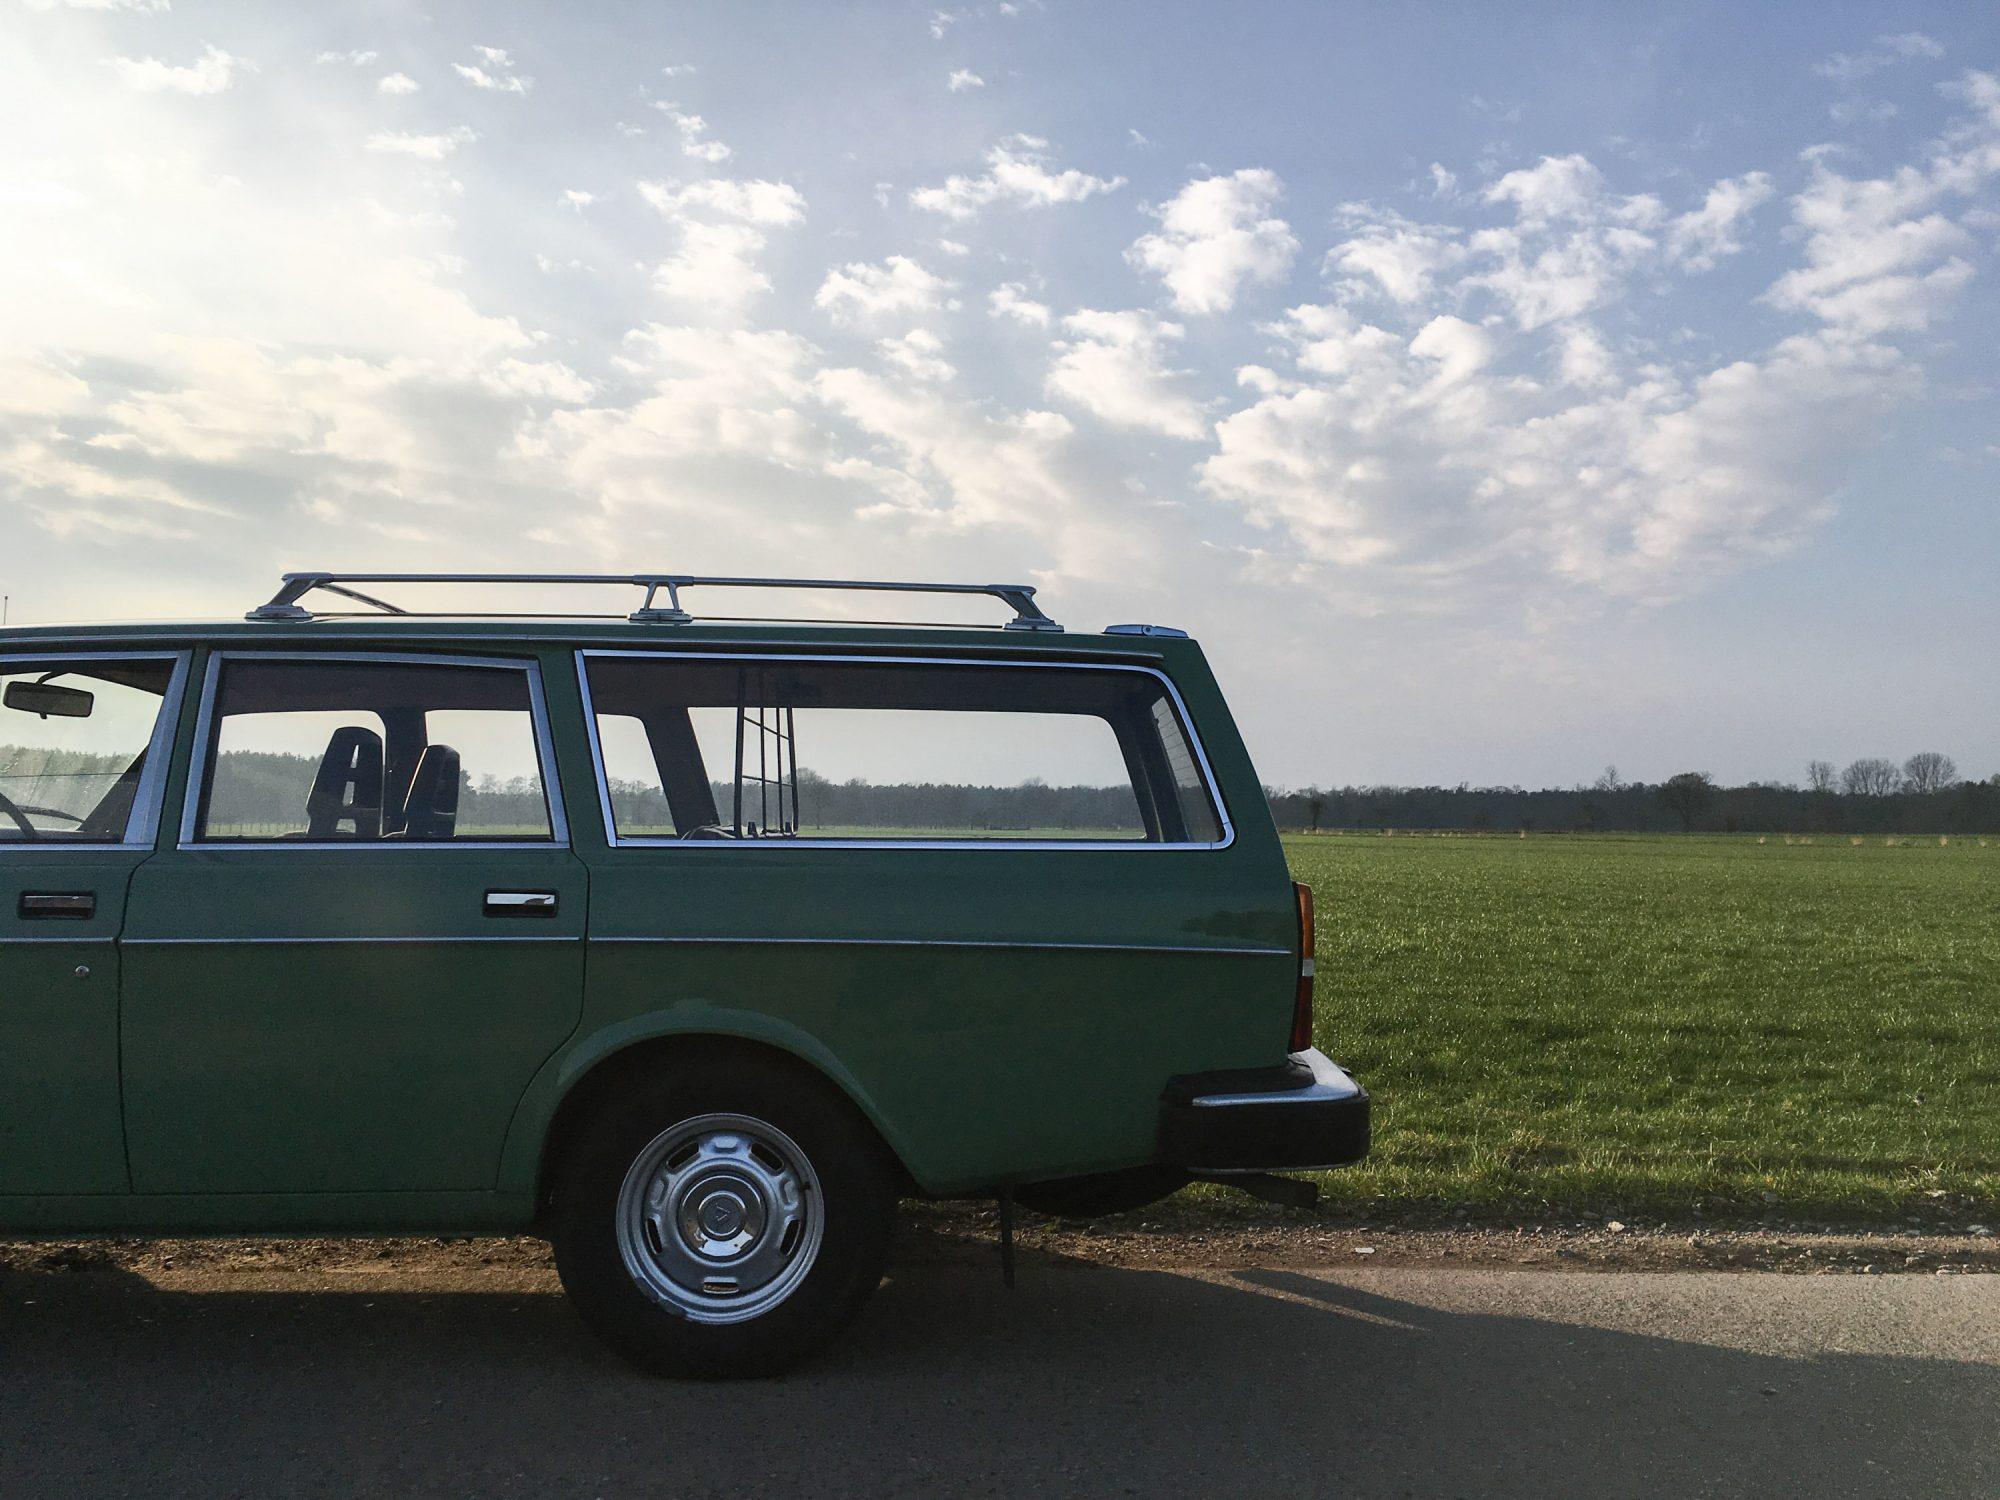 Yannick-Moonen-1976-Volvo-245L-Road-Trip-23-2000x1500